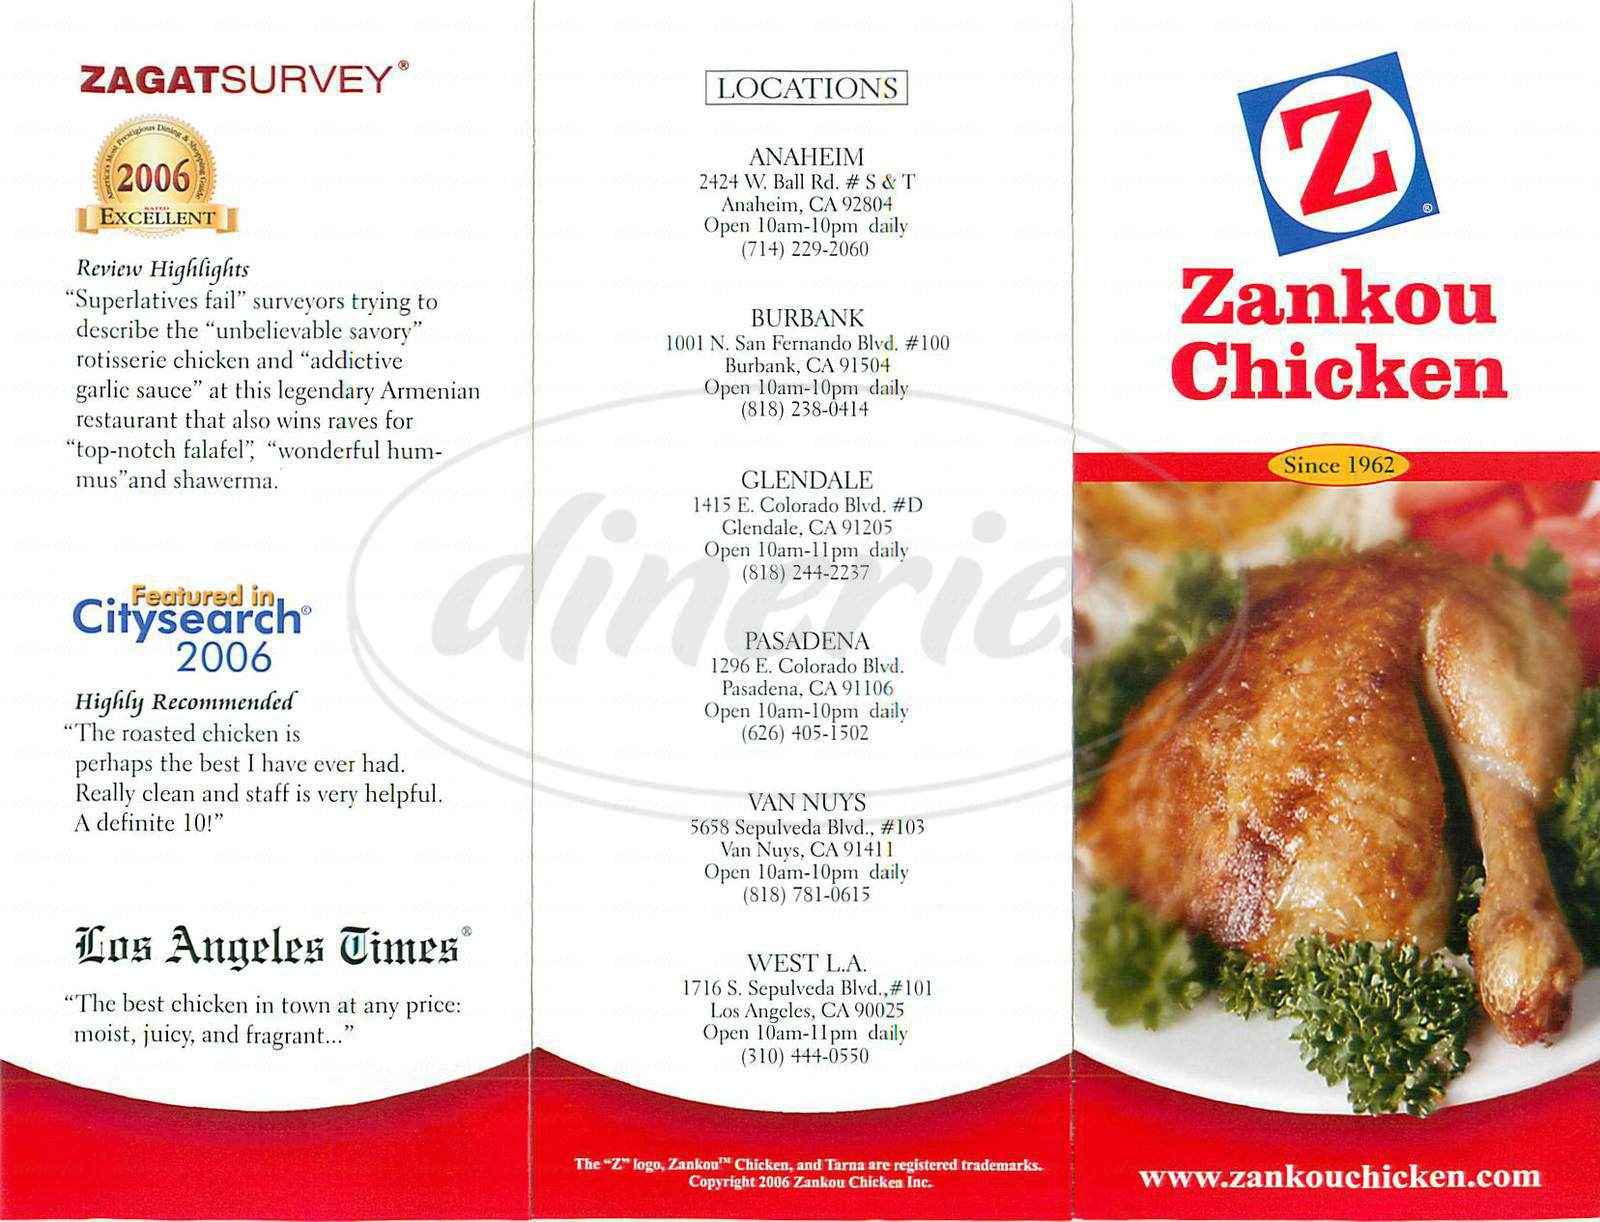 menu for Zankou Chicken